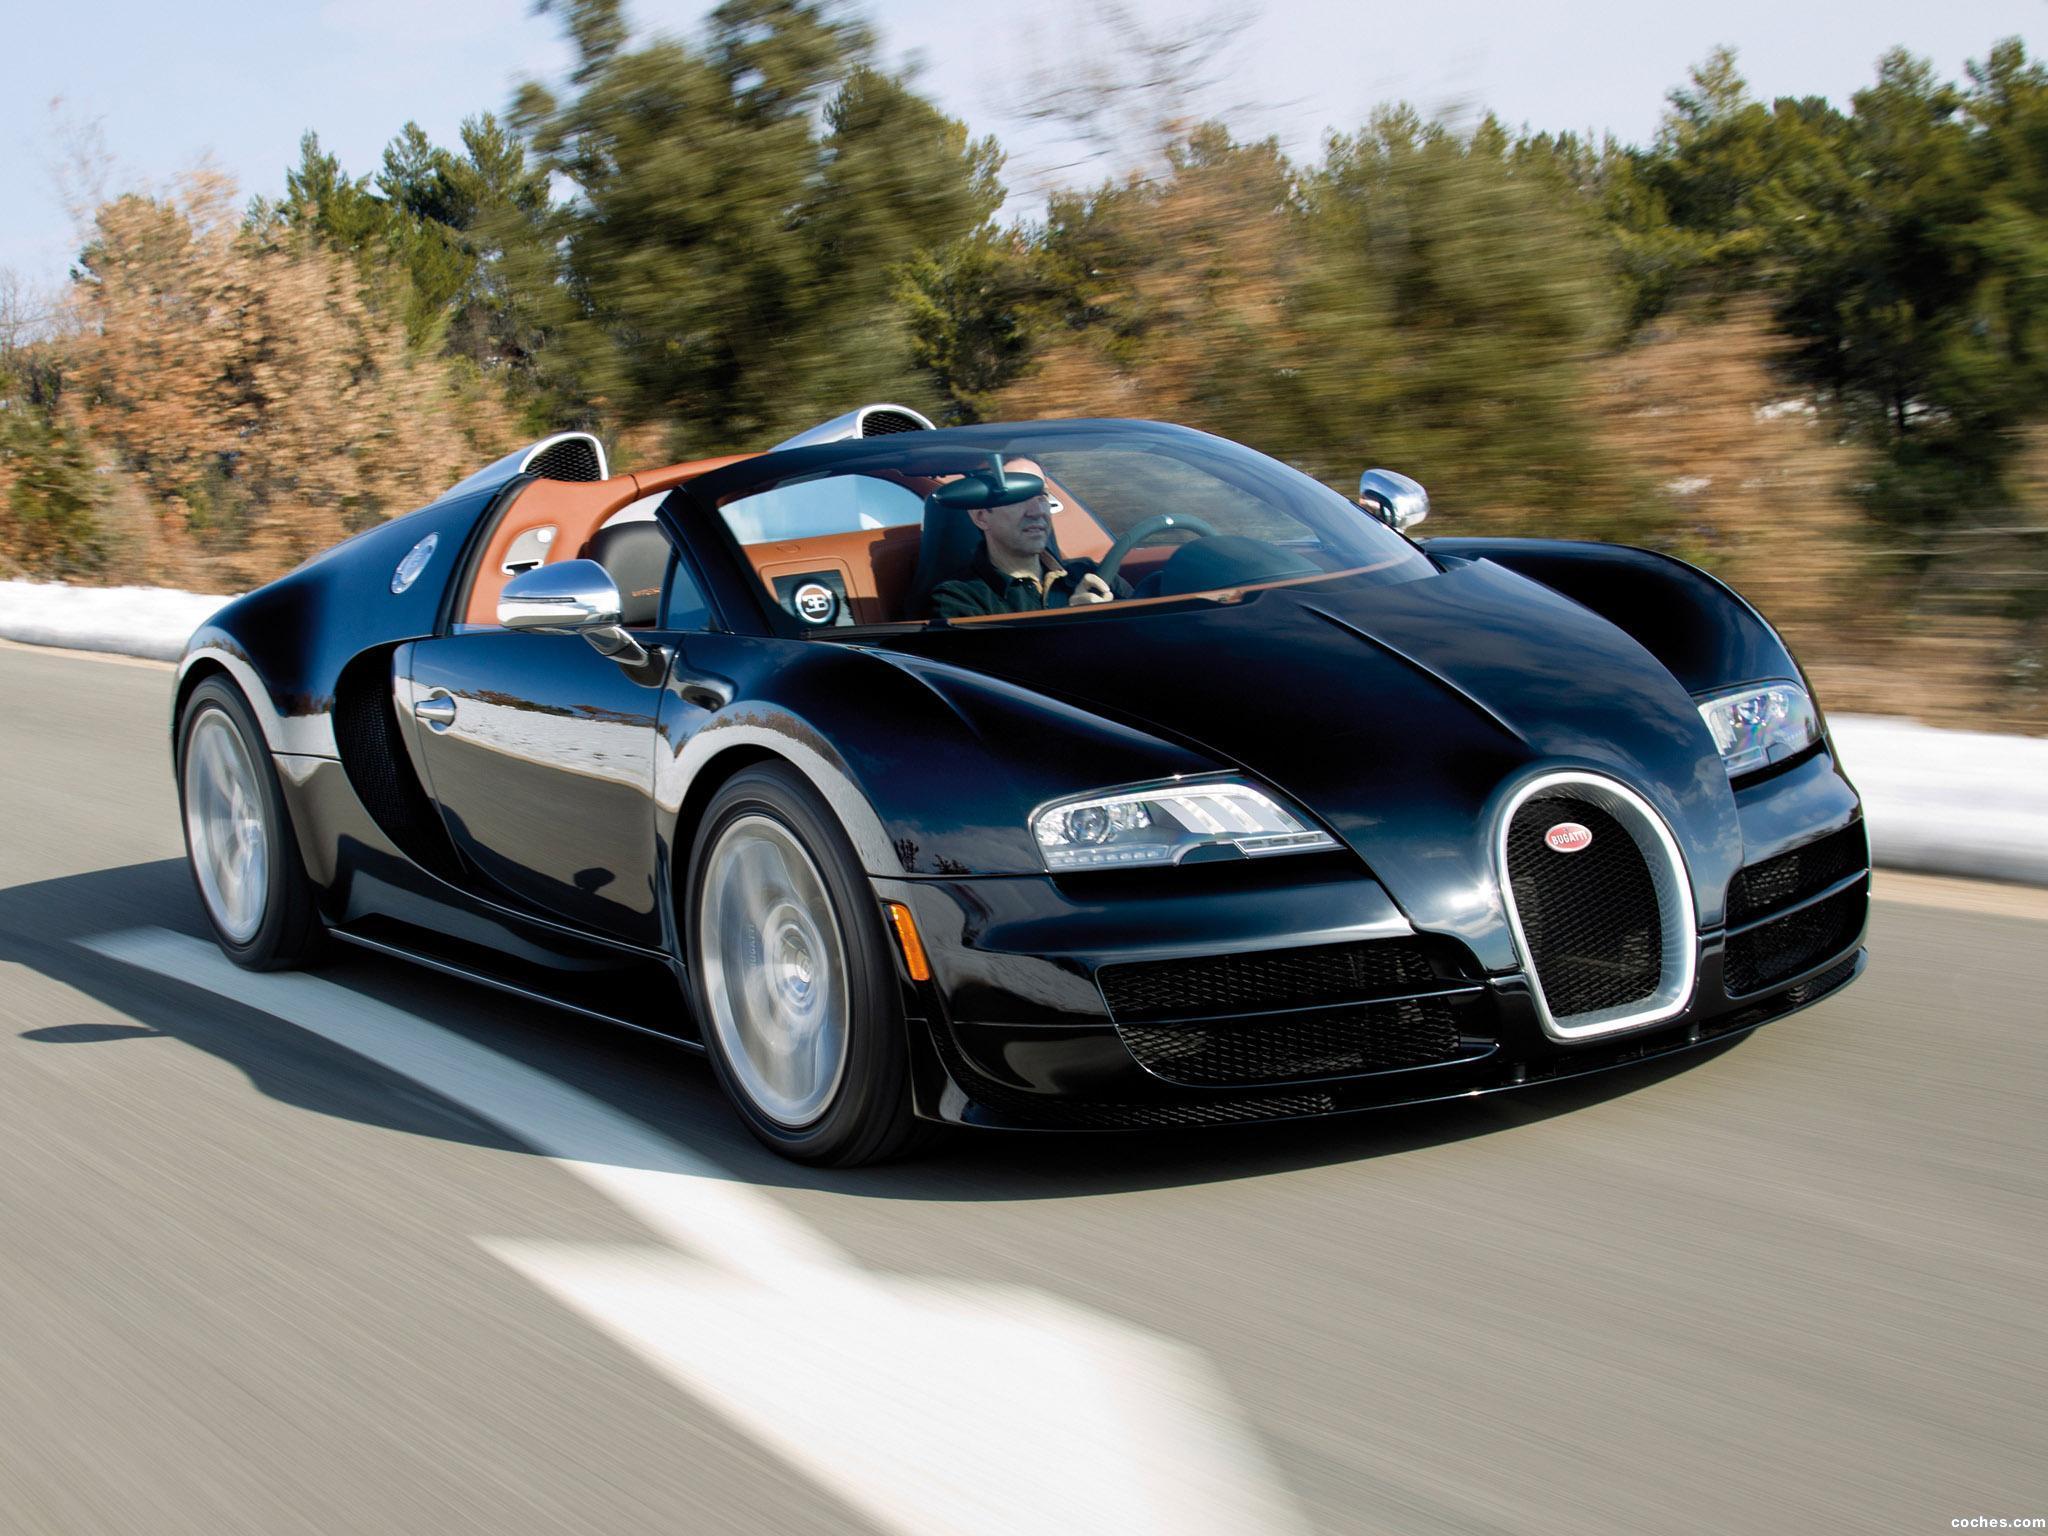 Fotos De Bugatti Veyron La Mayor Galeria De Fotos Del Bugatti Veyron